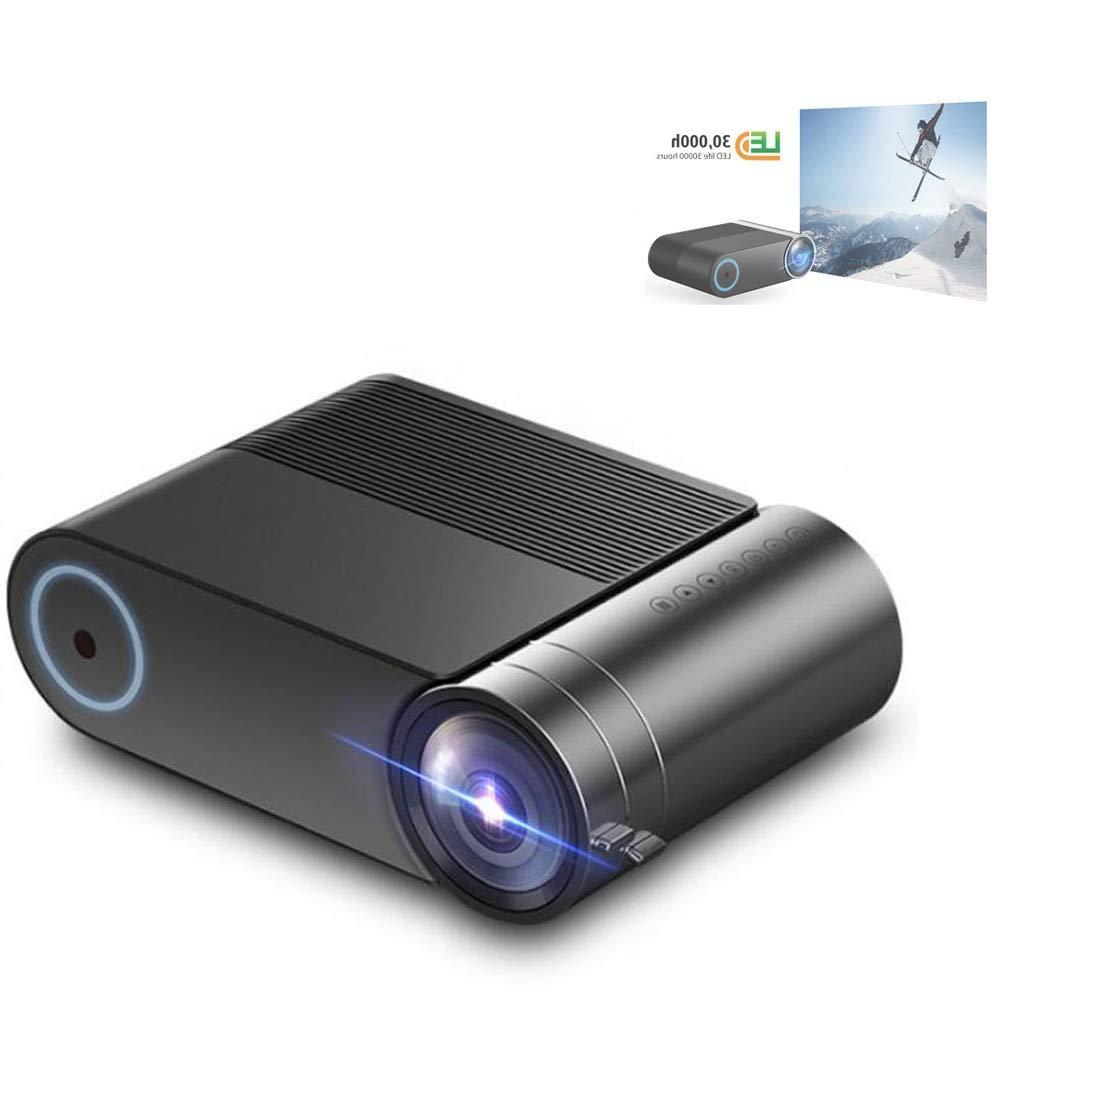 YG420ミニLEDプロジェクターネイティブ1280×720 HDポータブルビデオビーマーワイヤレスWiFiマルチスクリーン3D Proyector B07SG577MW